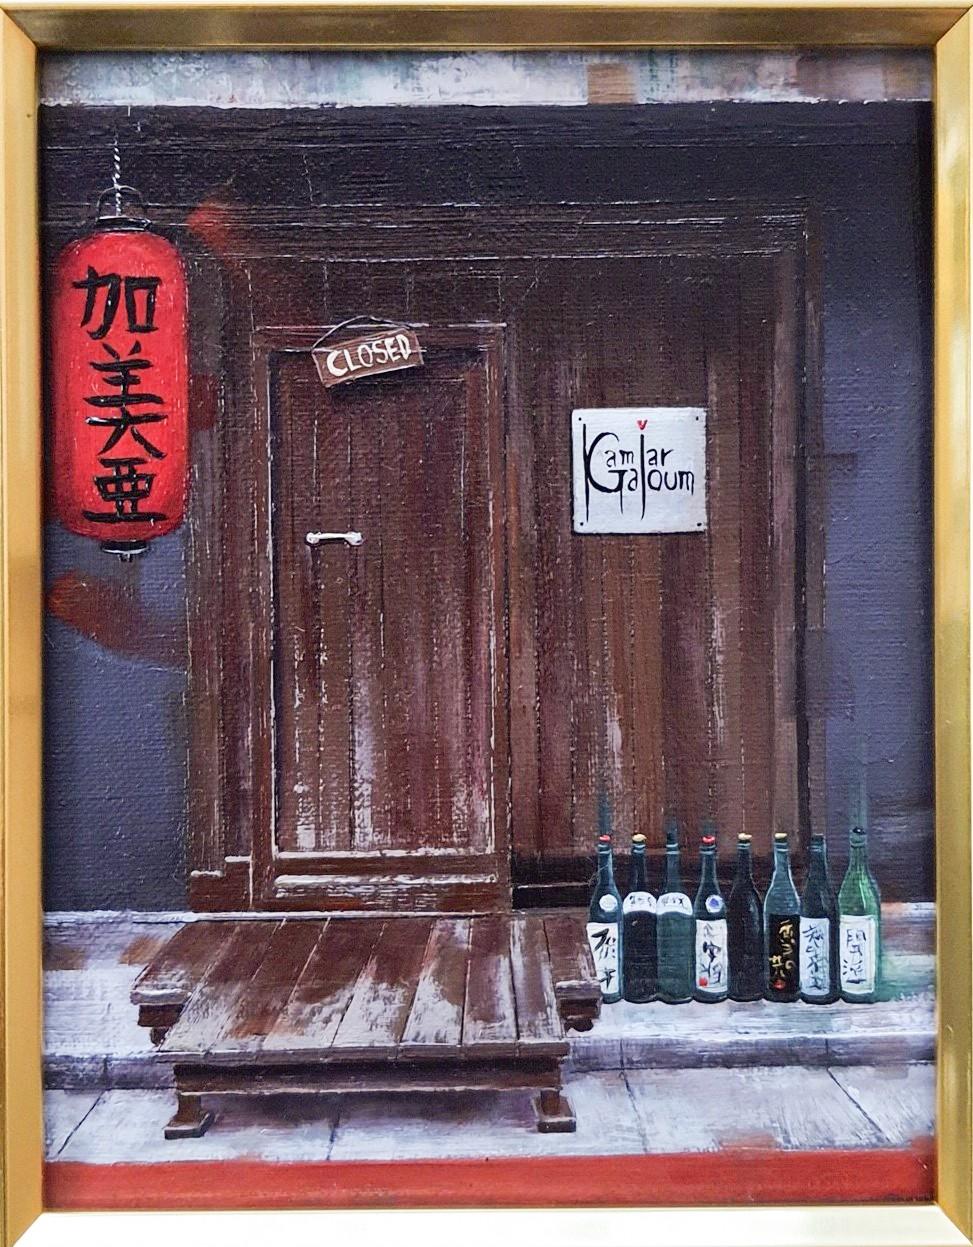 Kamiar Gajoum Izakaya Original Oil Painting 7x5.5